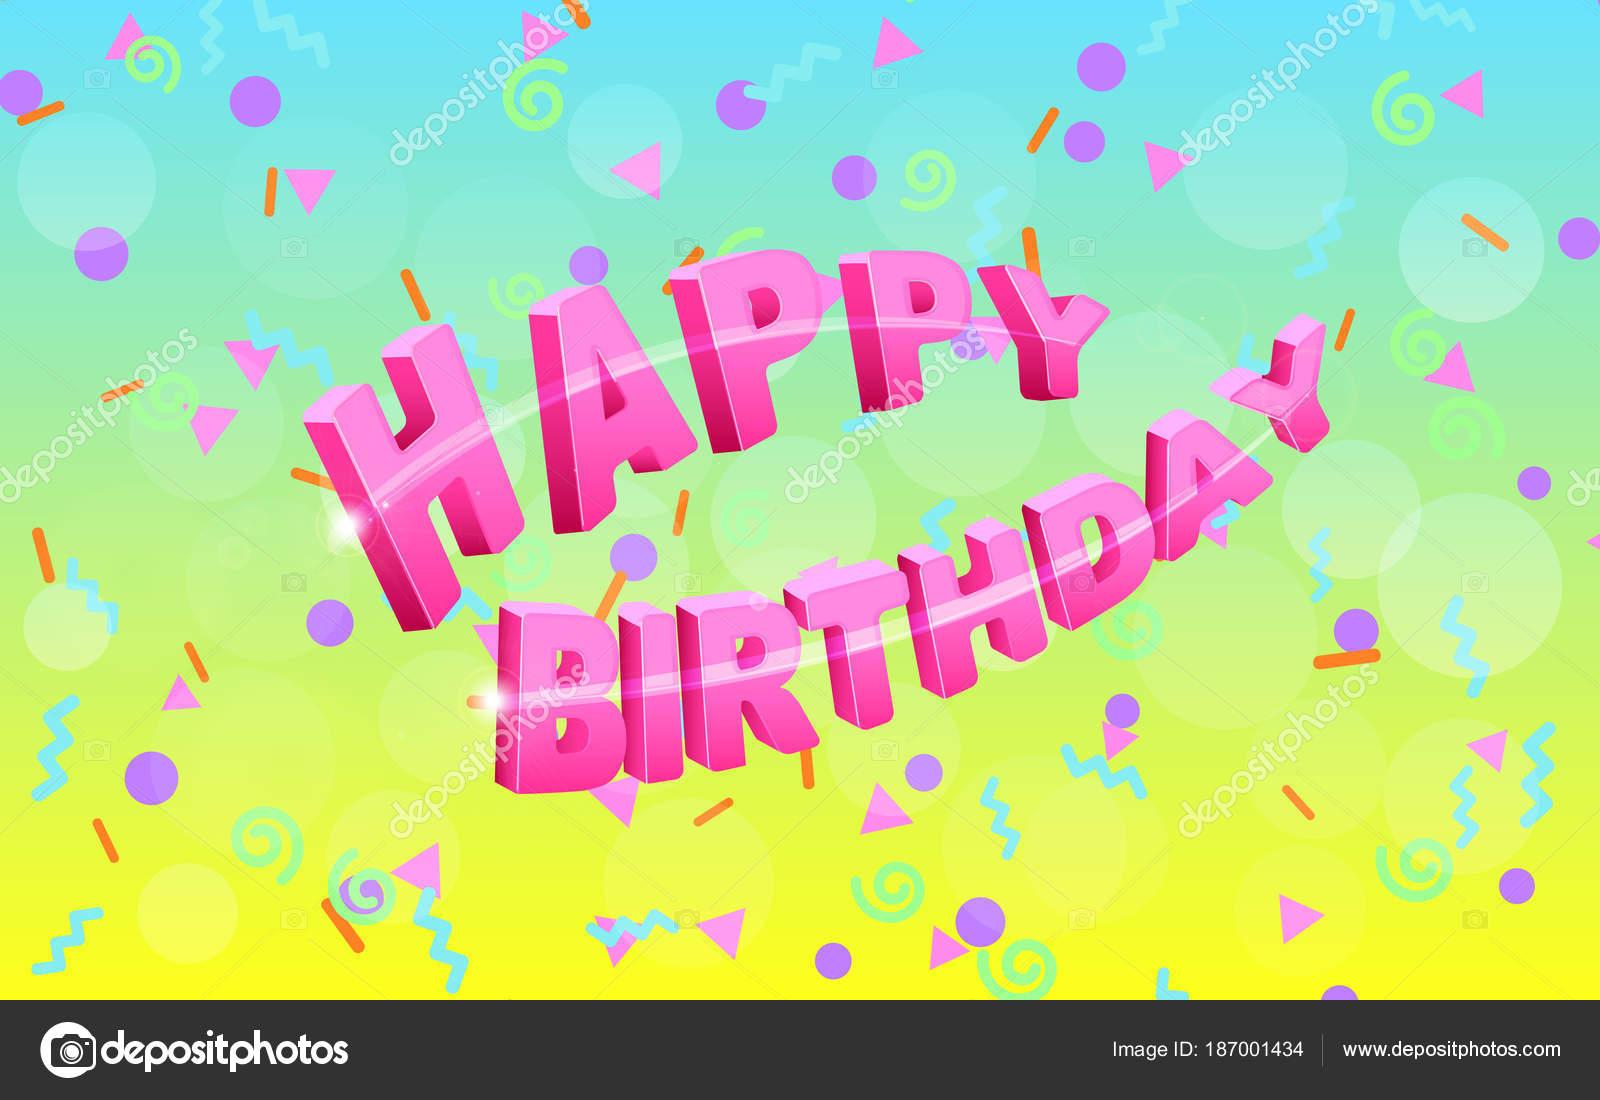 Festive Confetti Background For Happy Birthday Greeting Card